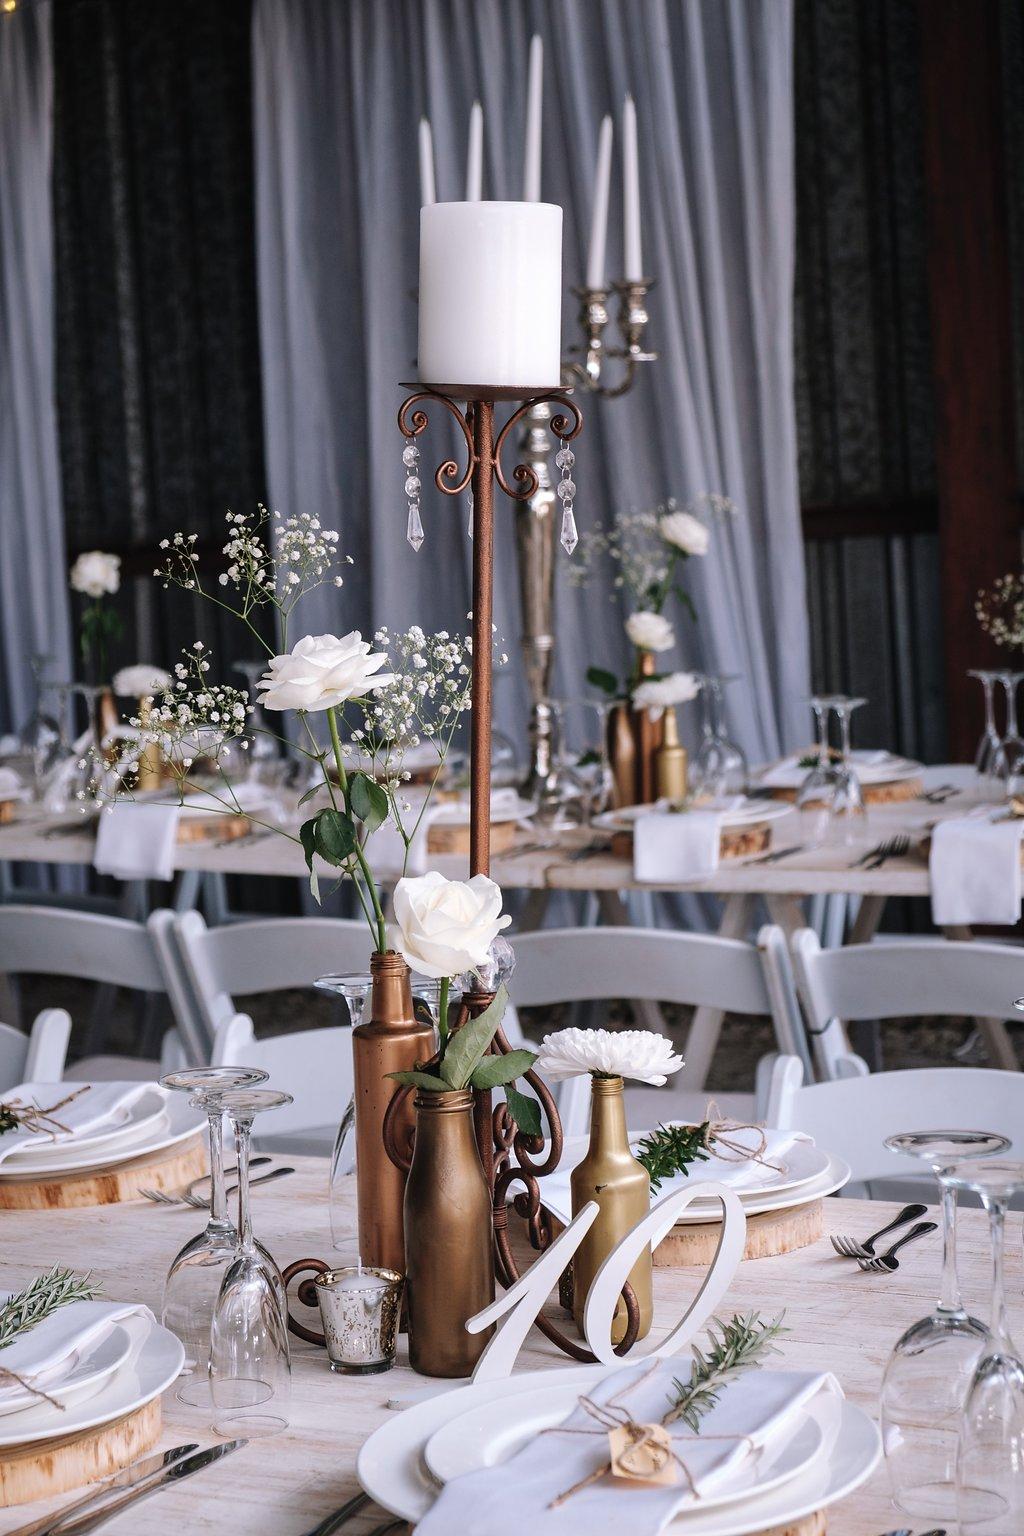 Gorgeous Gold Wedding Centerieces - Farm-Forest Wedding - The Overwhelmed Bride Wedding Blog